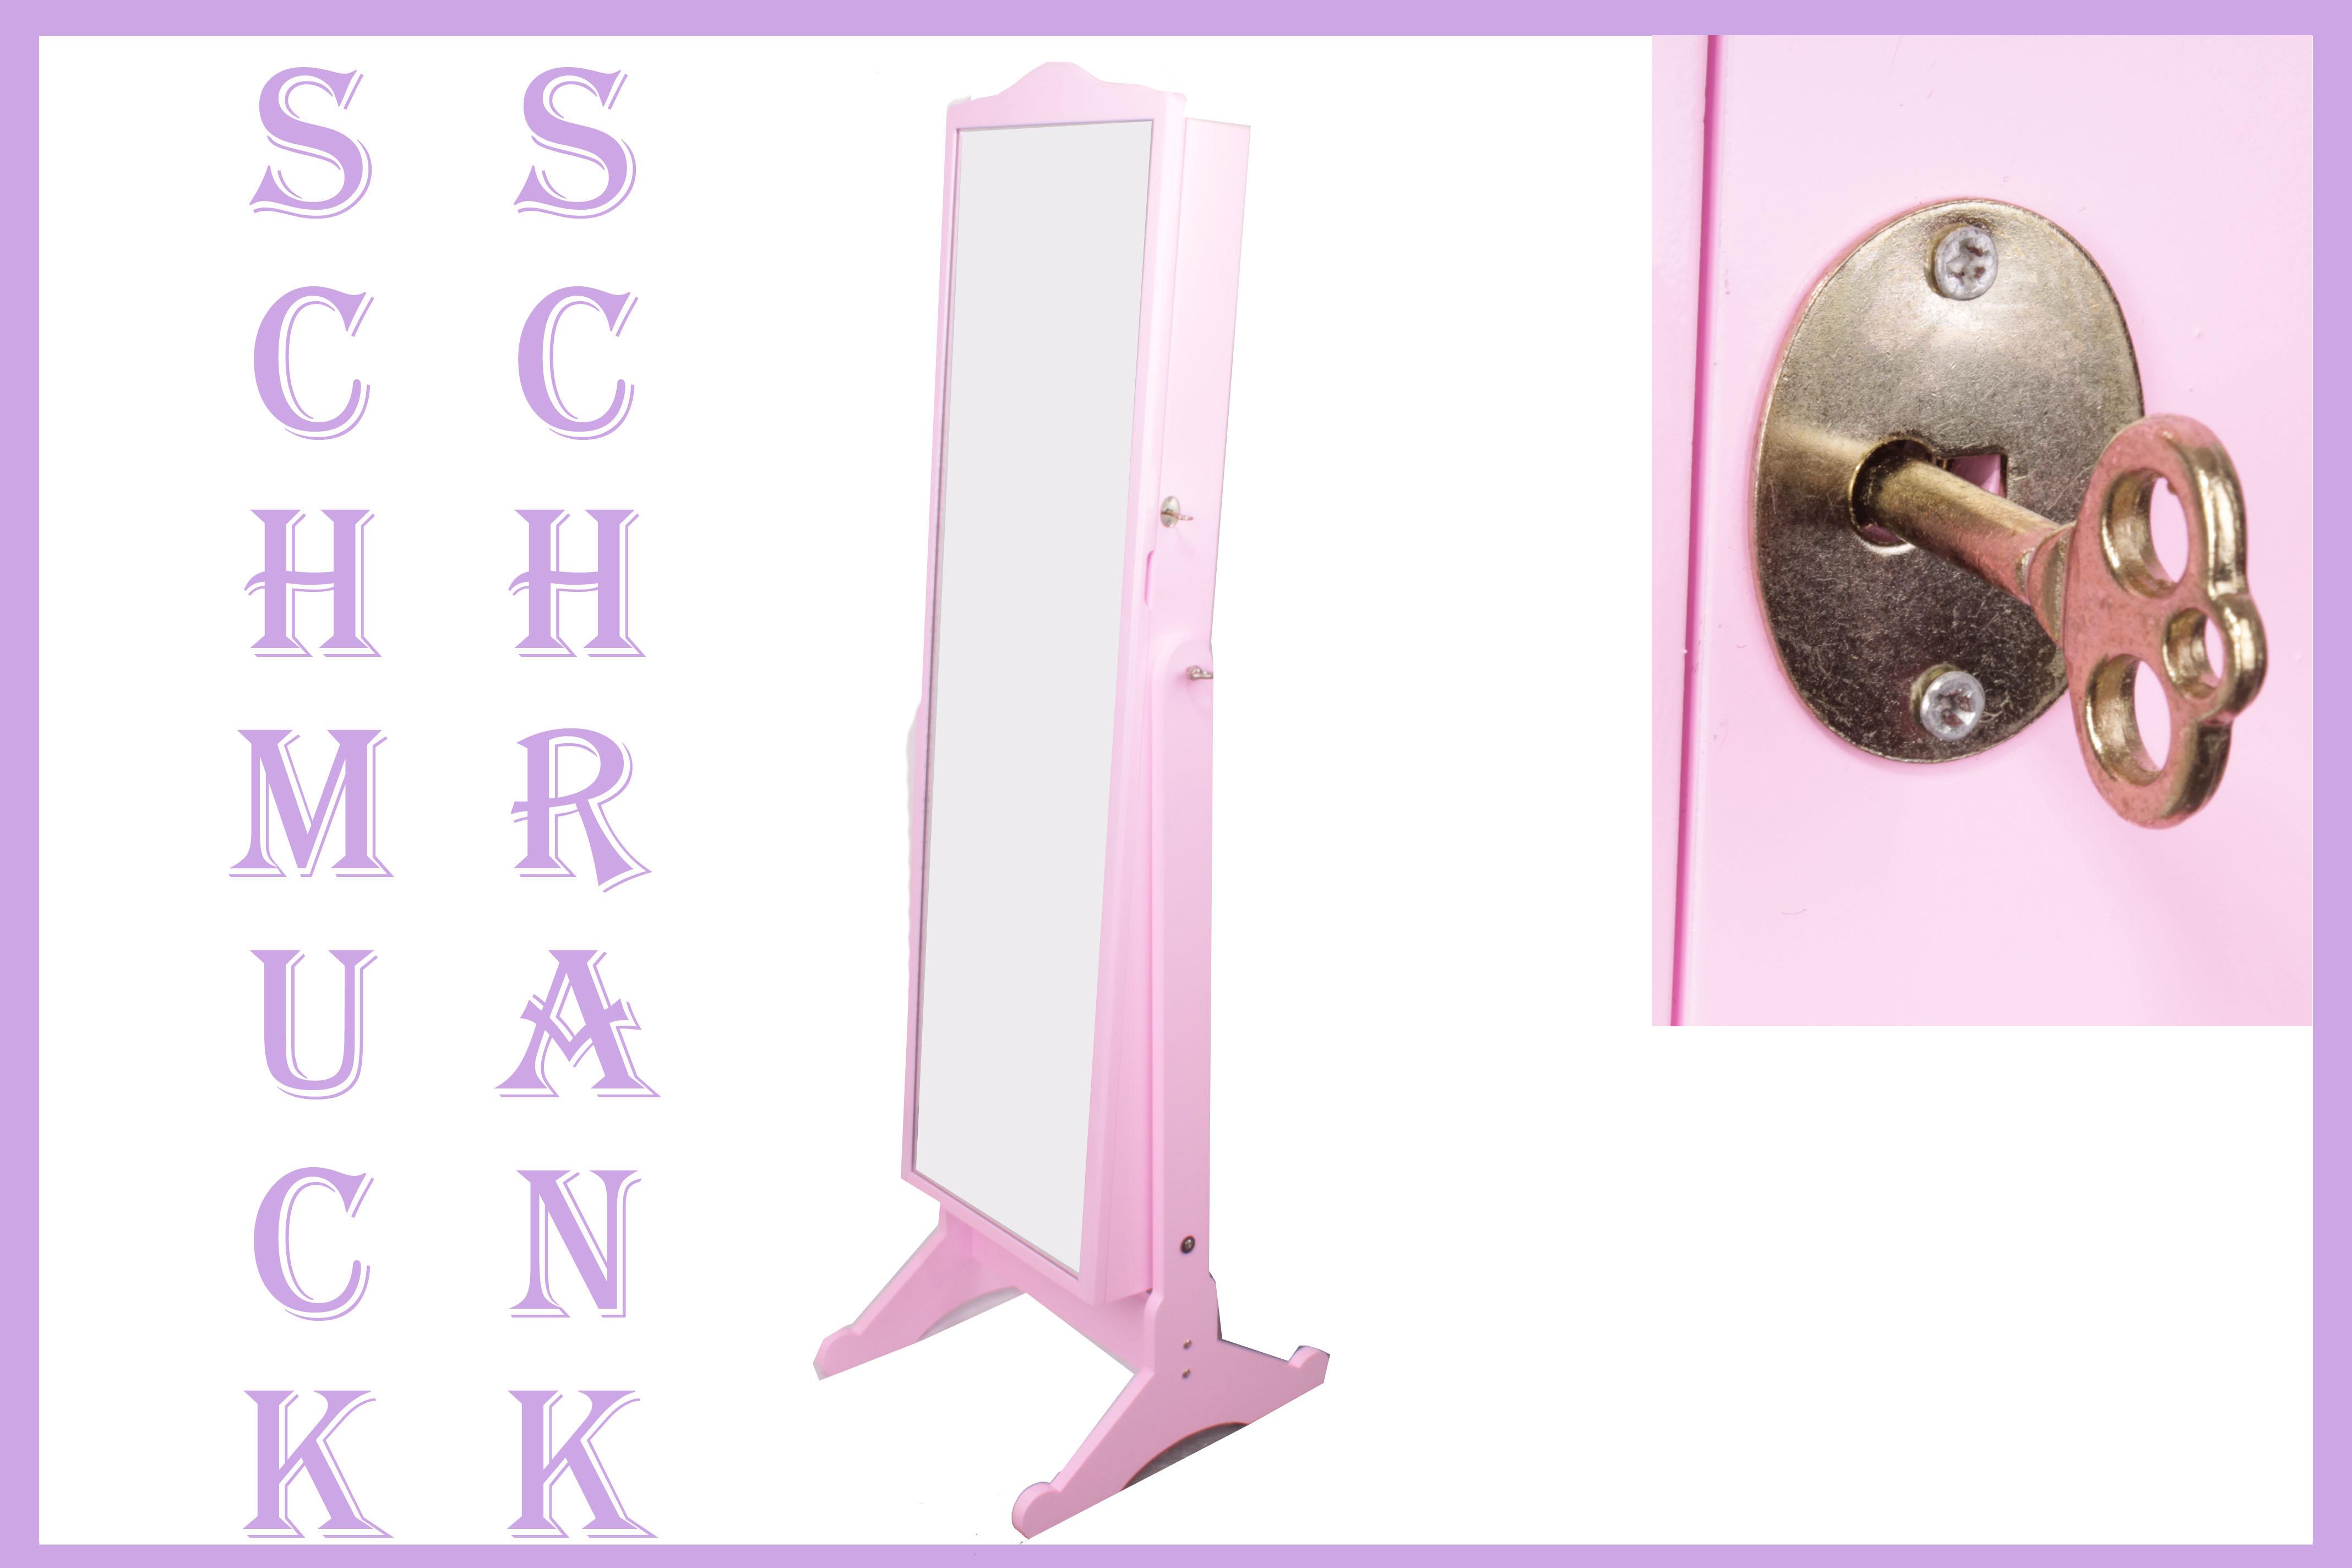 spiegel schmuckschrank schrank schmuck ohrringe ringe. Black Bedroom Furniture Sets. Home Design Ideas